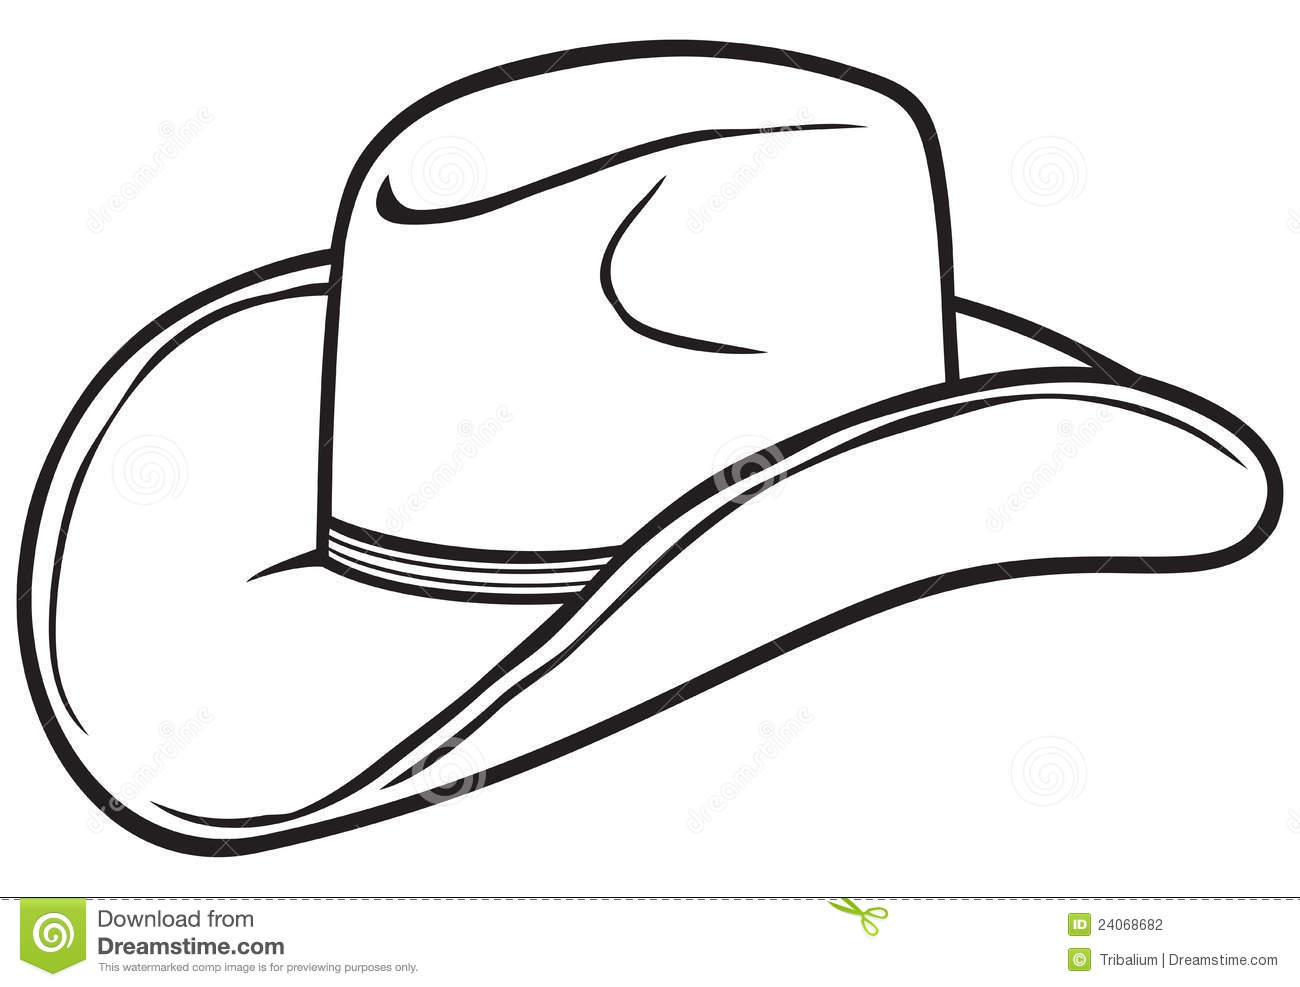 cowboy-hat-clipart-black-and-white-cowboy-hat-24068682 jpgCowboy Boots Clip Art Black And White